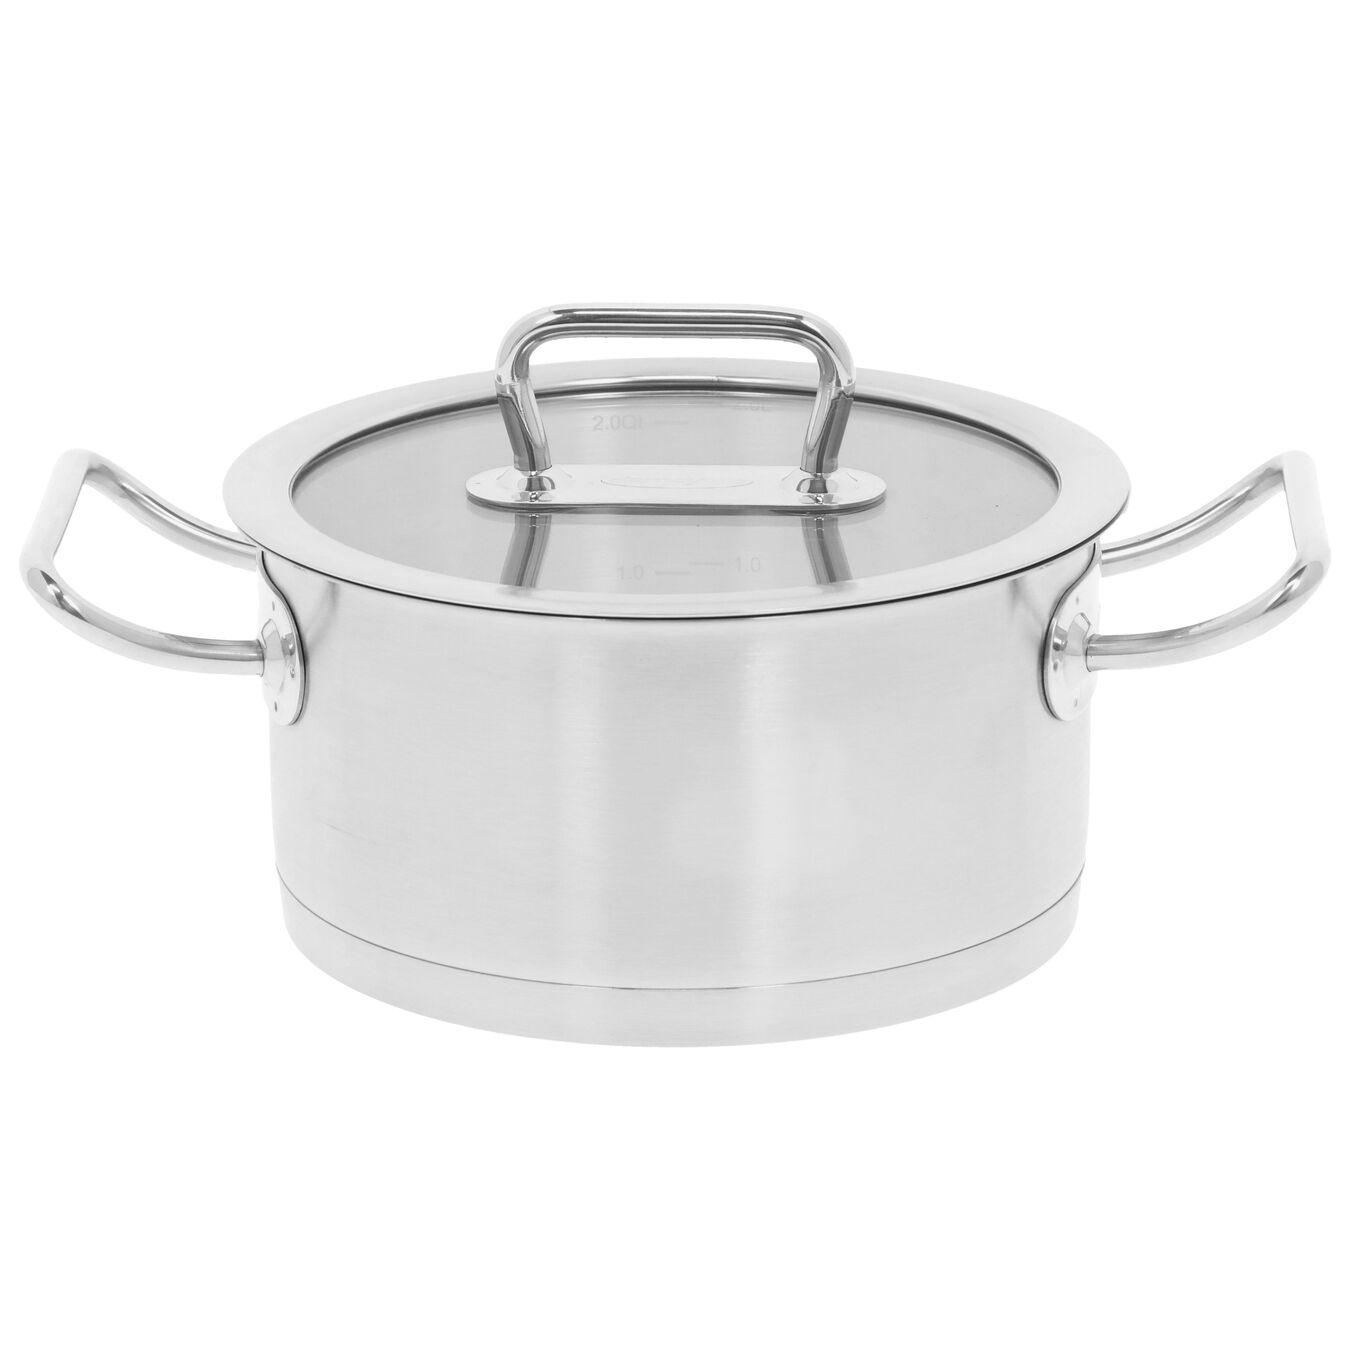 Kookpan met glazen deksel 20 cm / 3 l,,large 1